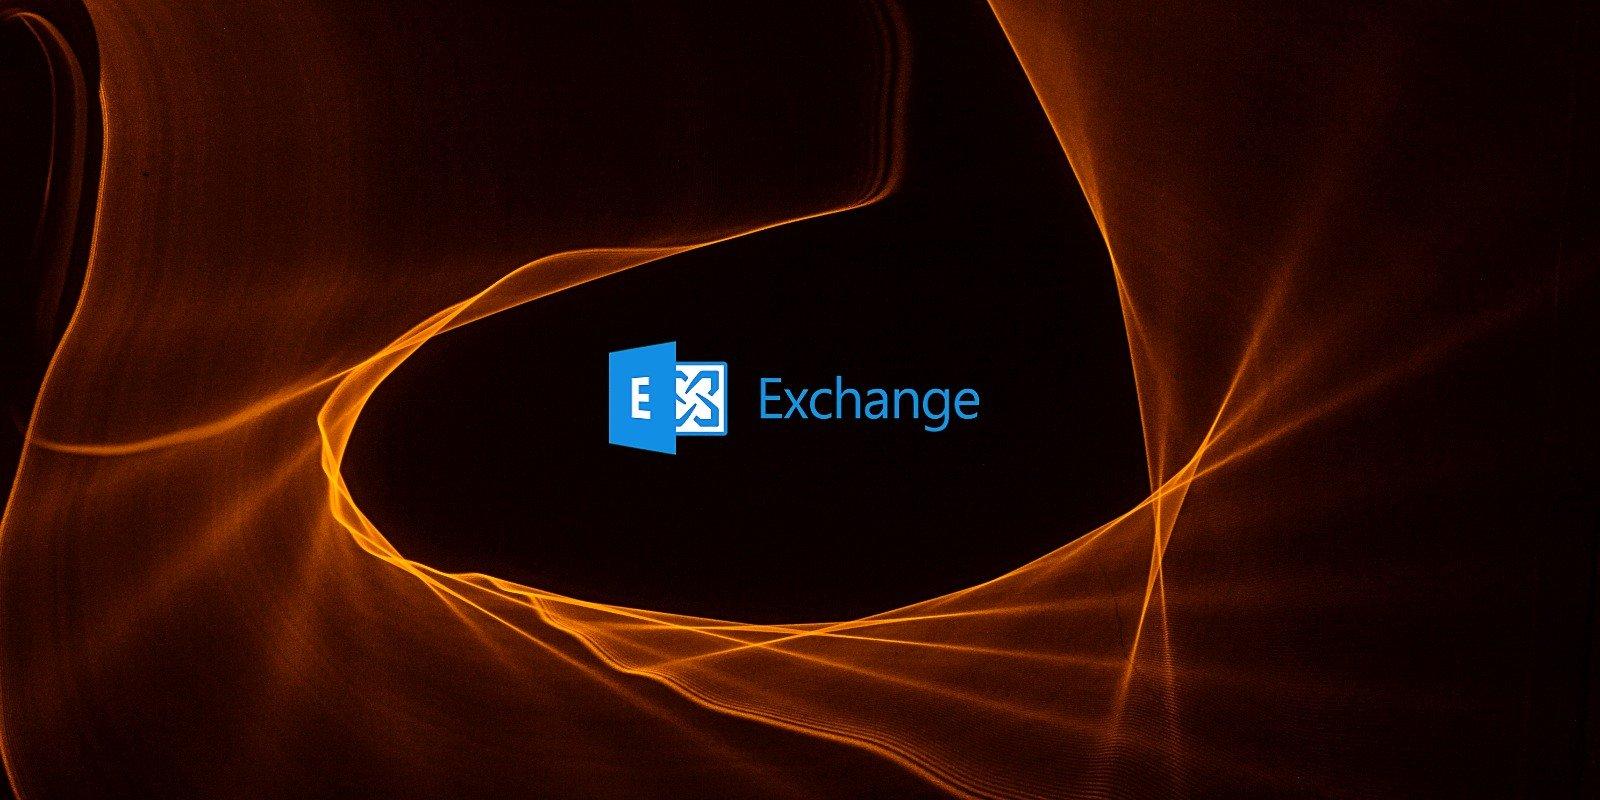 Exchange1-1.jpg